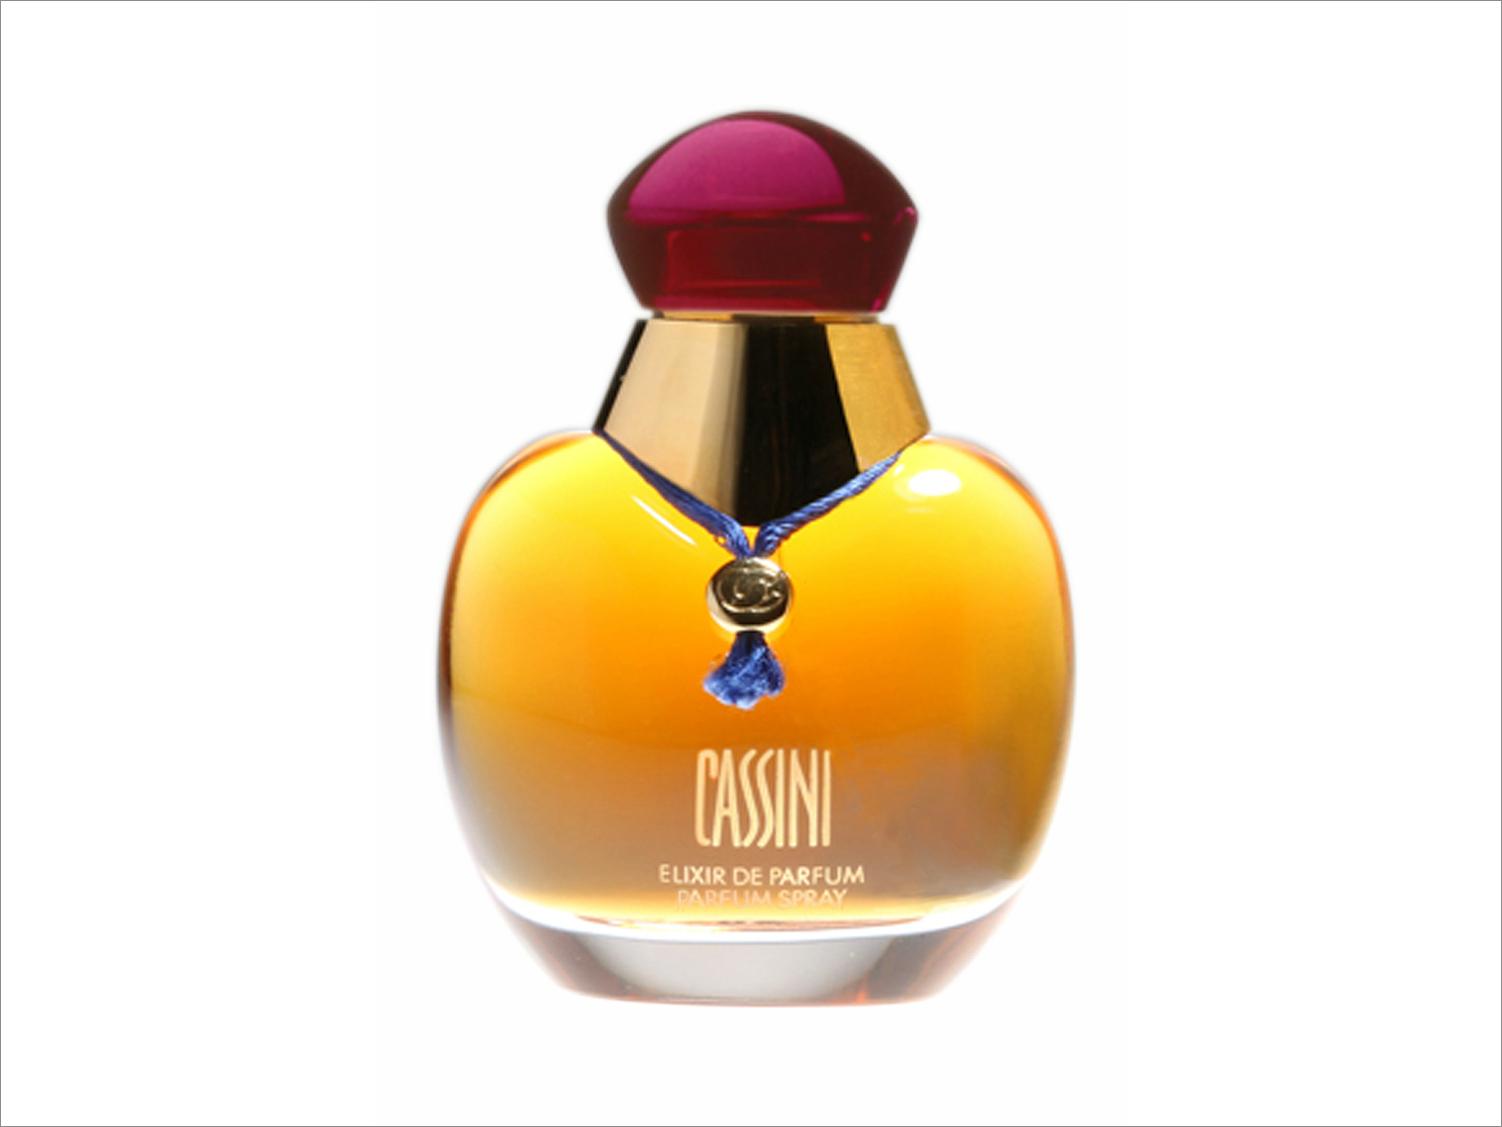 Oleg Cassini fragrance wedding perfume ideas summer beauty